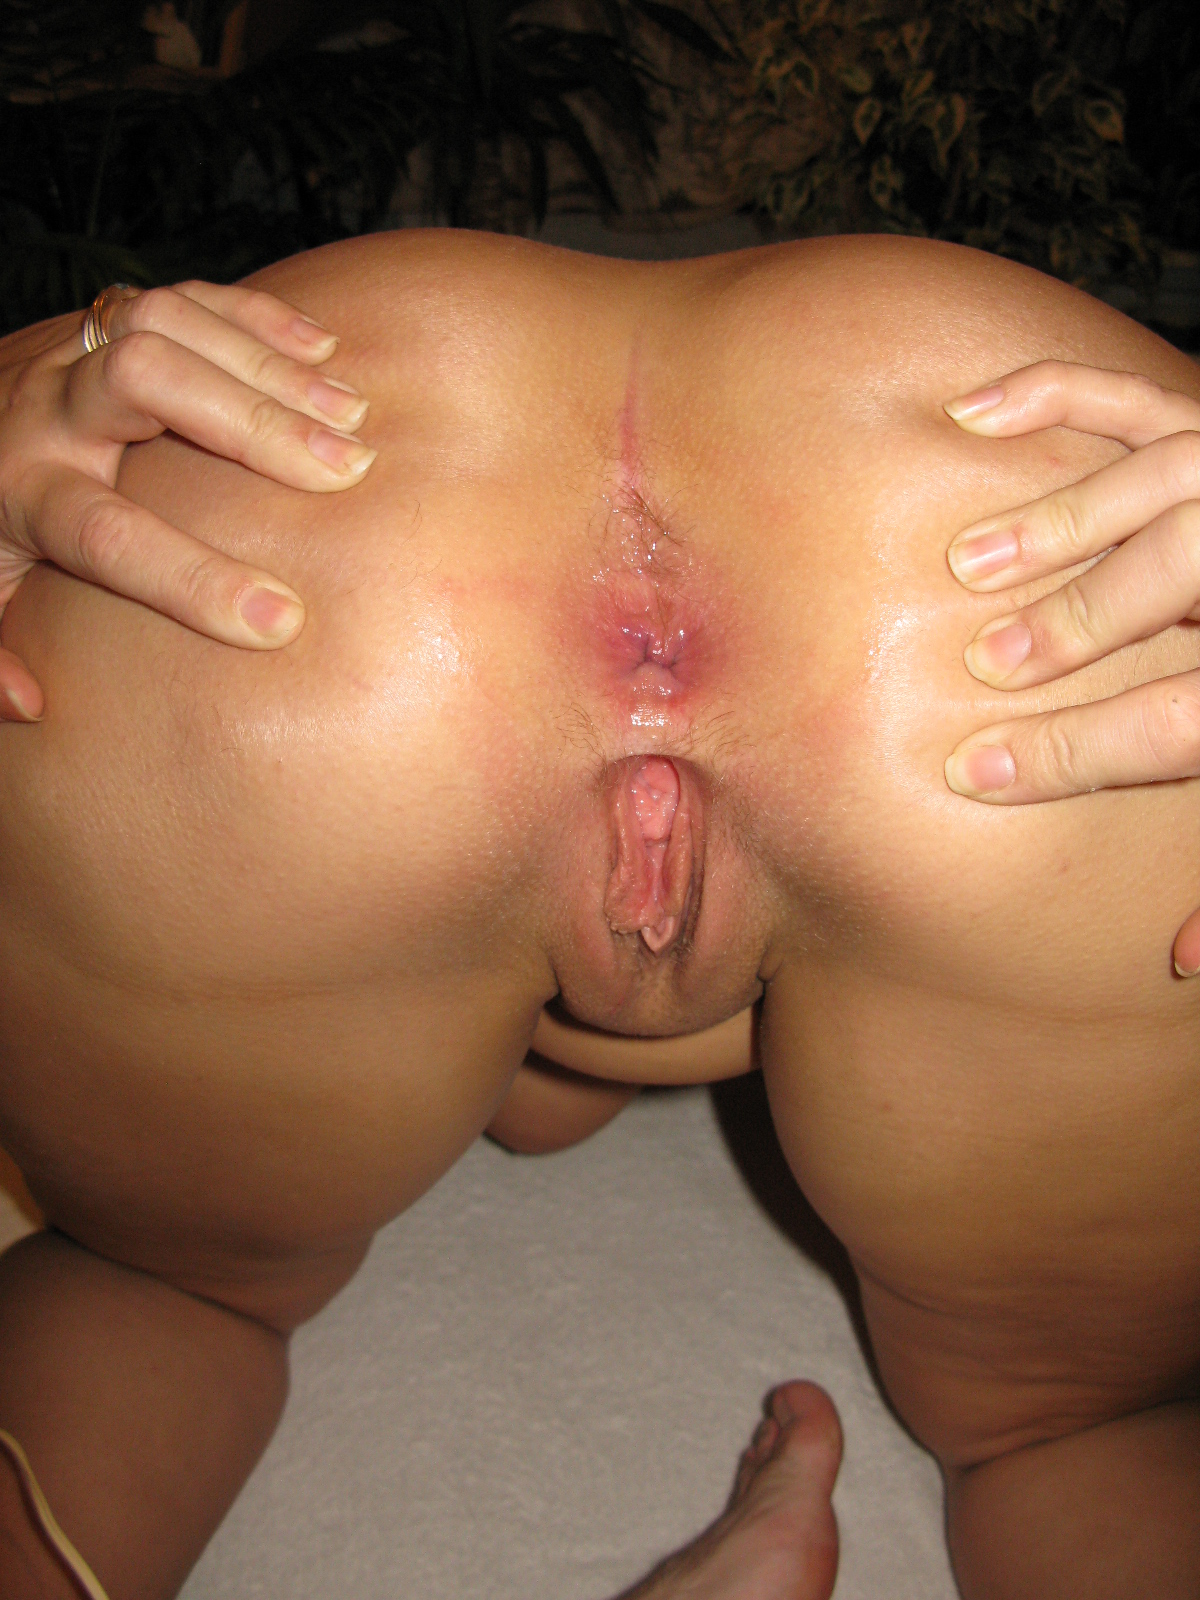 Раздвигая ноги дома блондинка бахвалится розовую манду секс фото